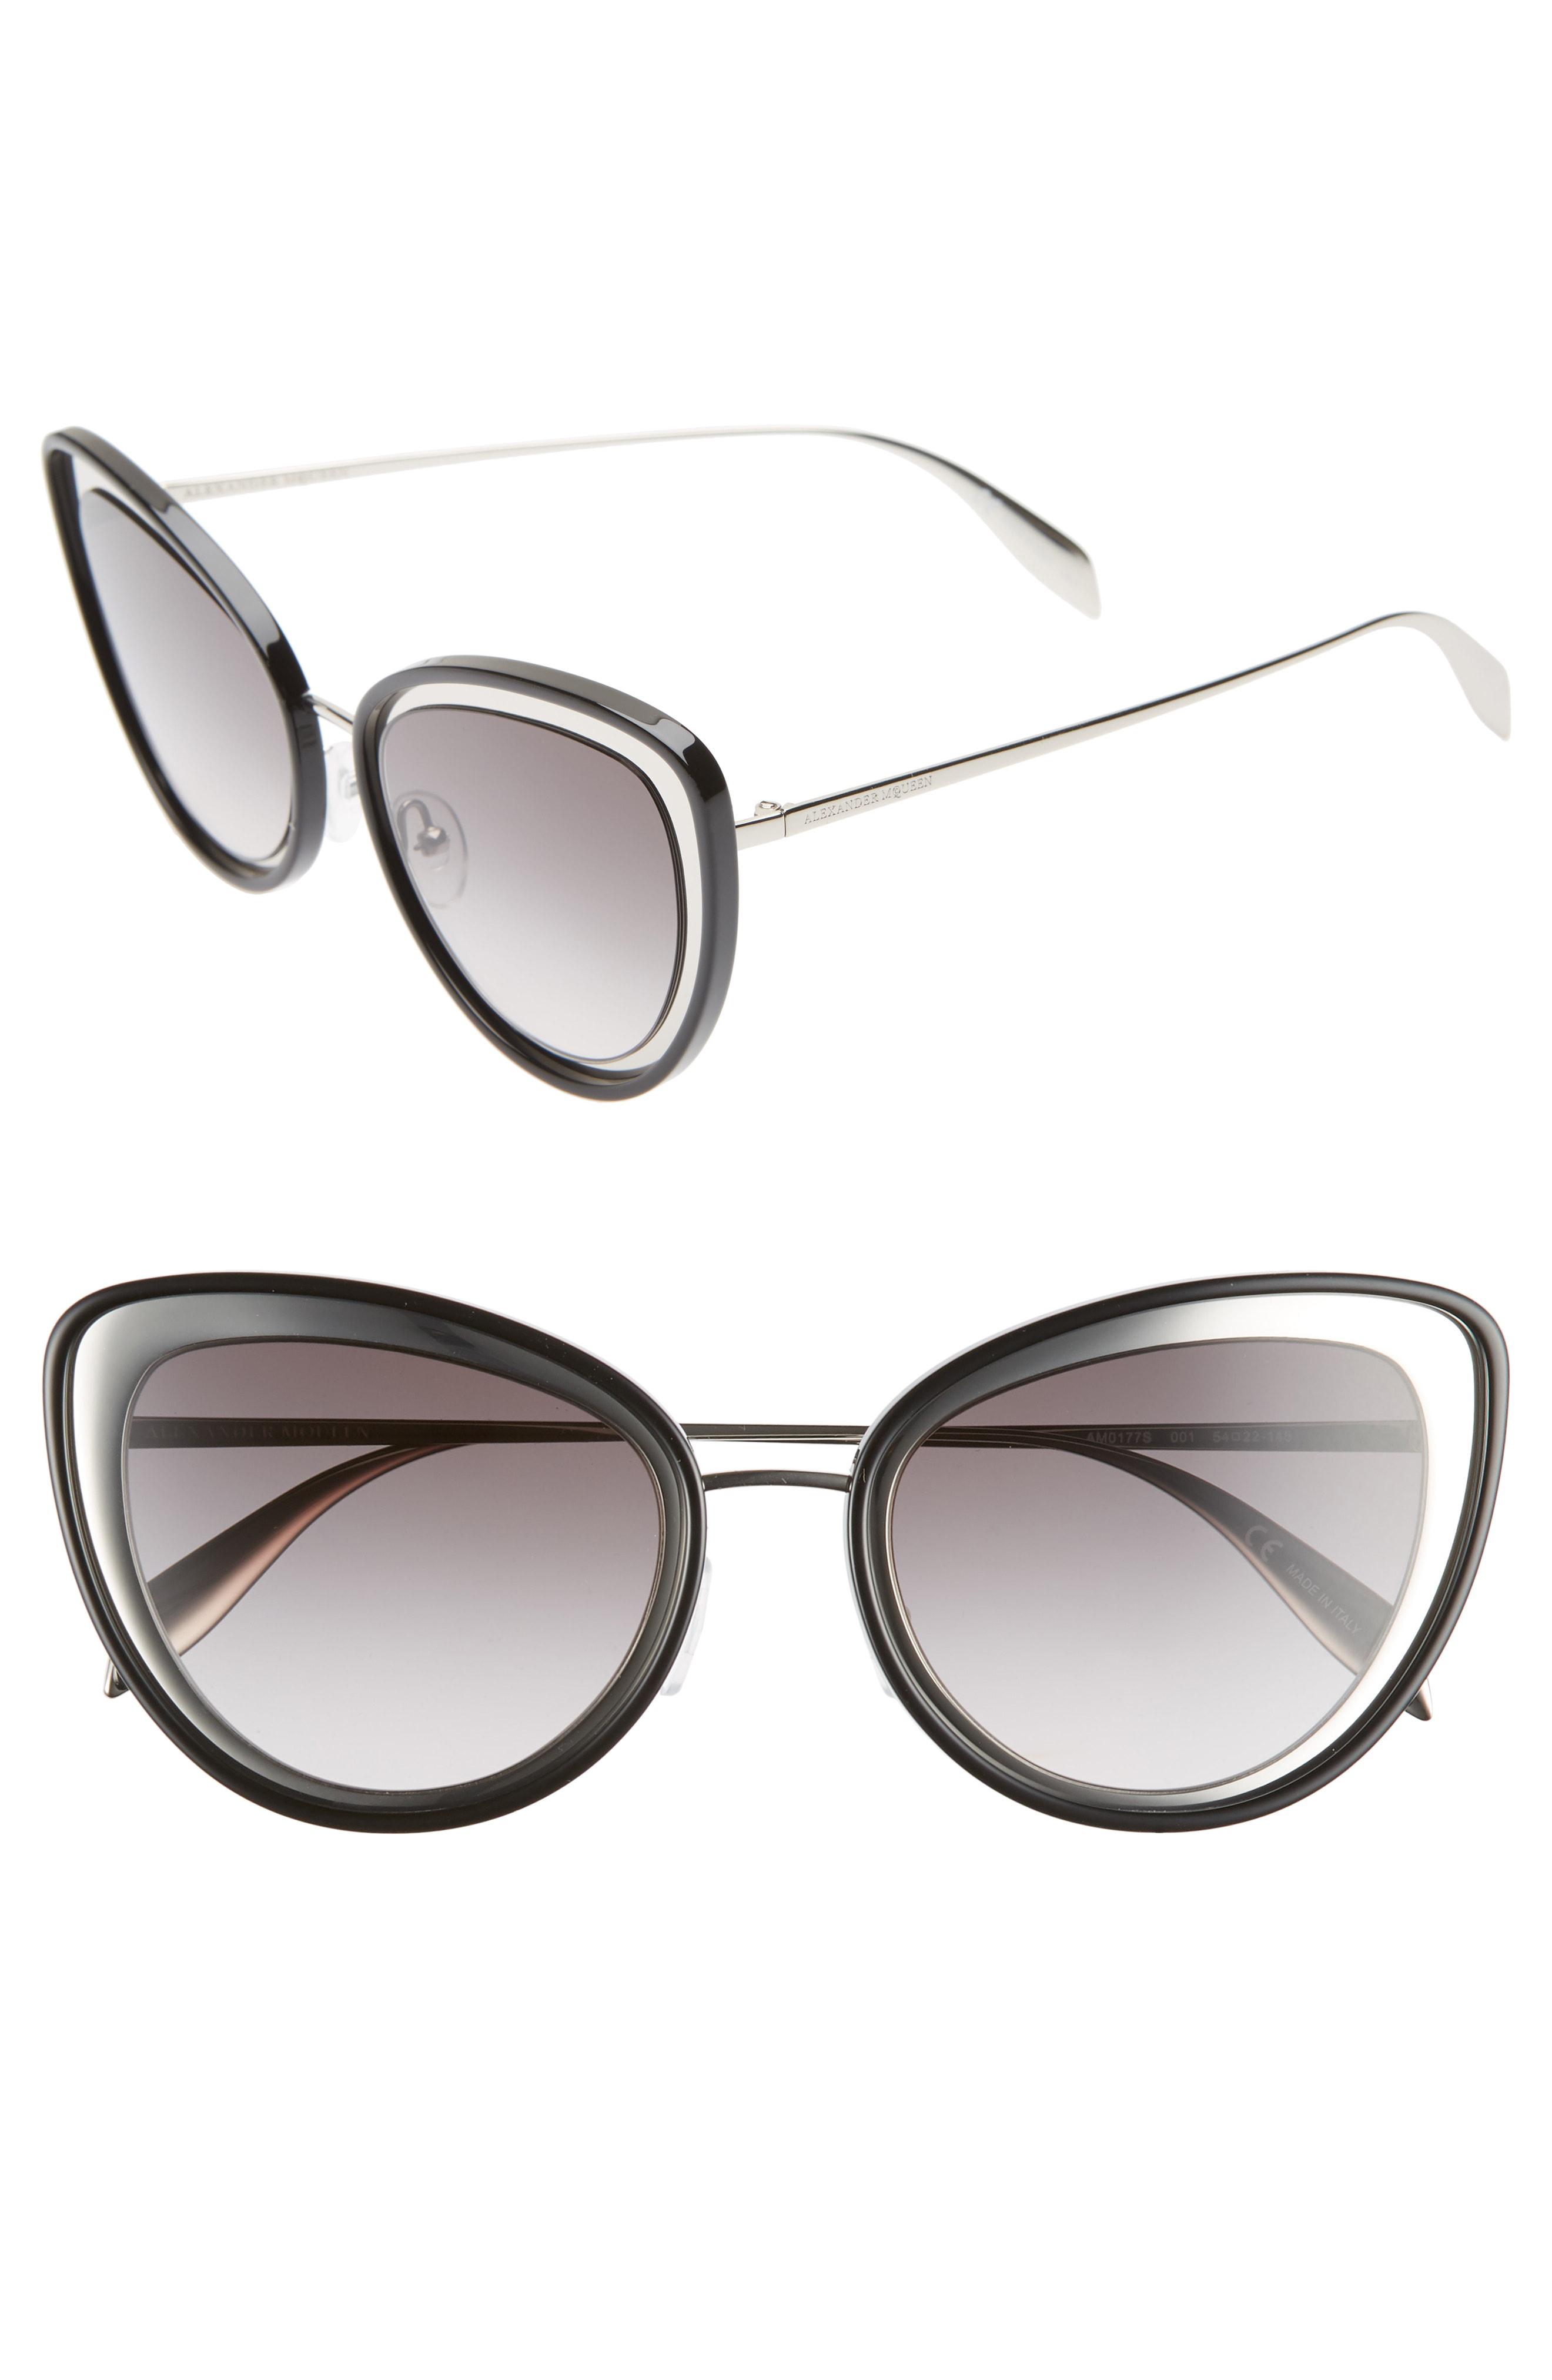 McQ Alexander McQueen Womens Cat Eye Sunglasses MQ0043S-30000661-004